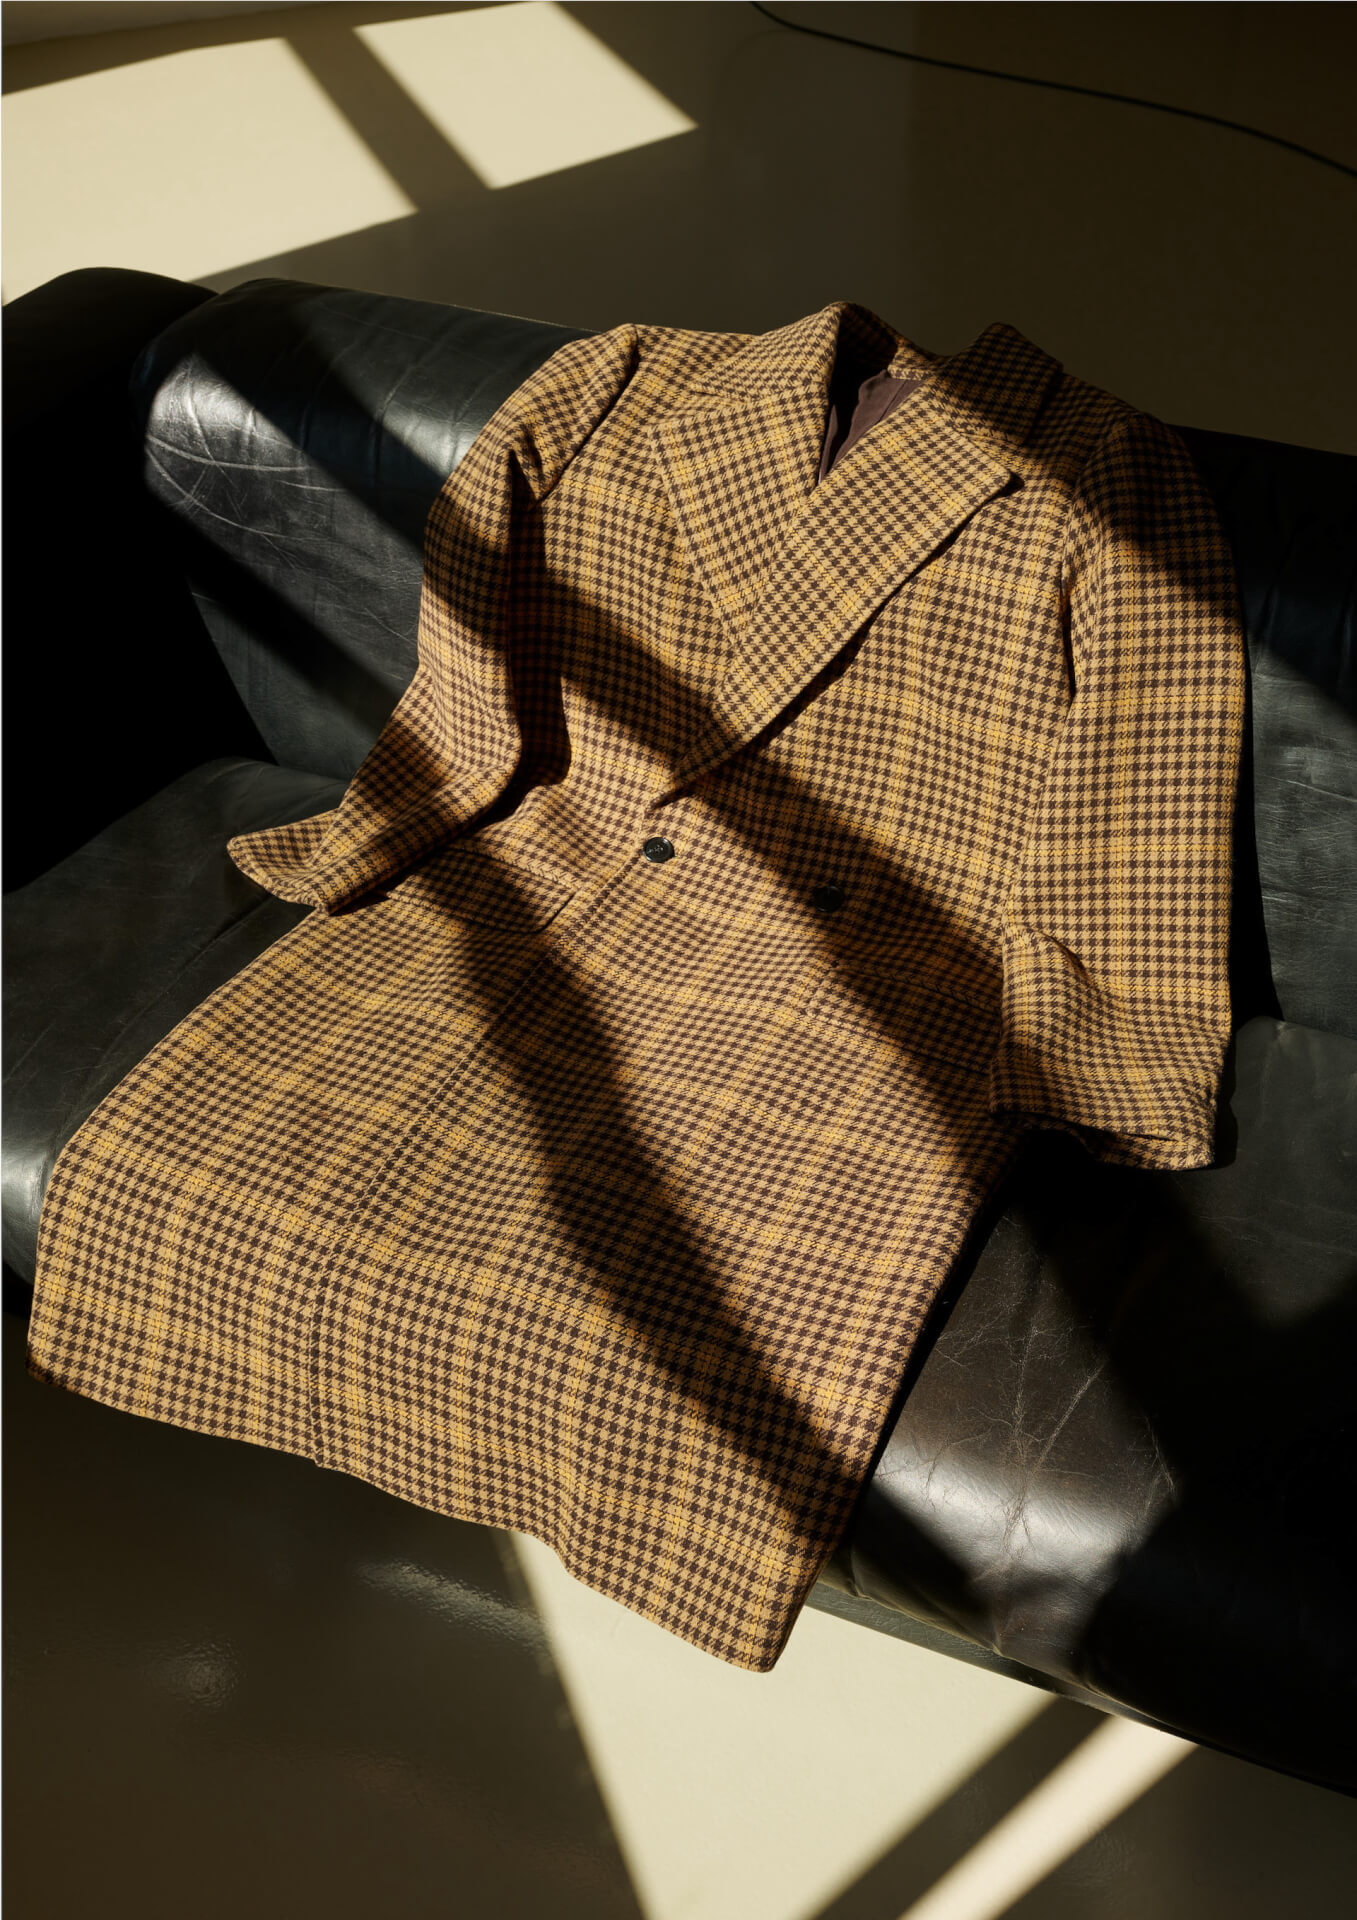 H&Mが俳優のジョン・ボイエガとタッグを組んだメンズウェアコレクションを発表!リサイクル素材、オーガニック素材を使用したアイテムが登場 life211006_handm_john_boyega_012